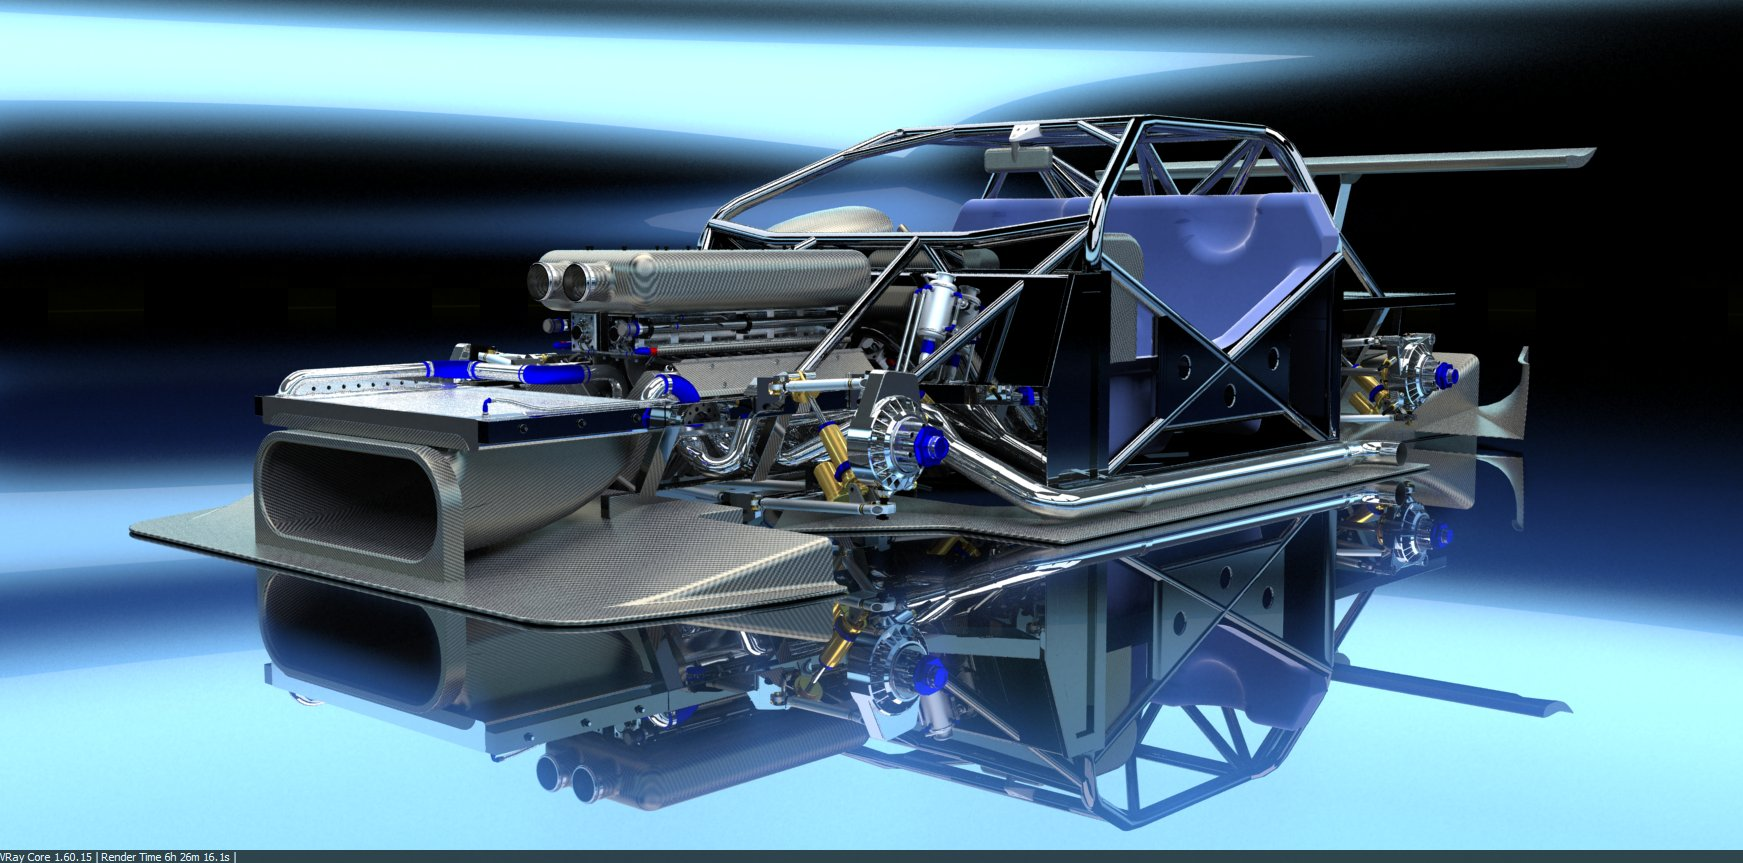 PEASNELL RACING DESIGN 575 GTC HILLCLIMB CAR DETAIL (3)